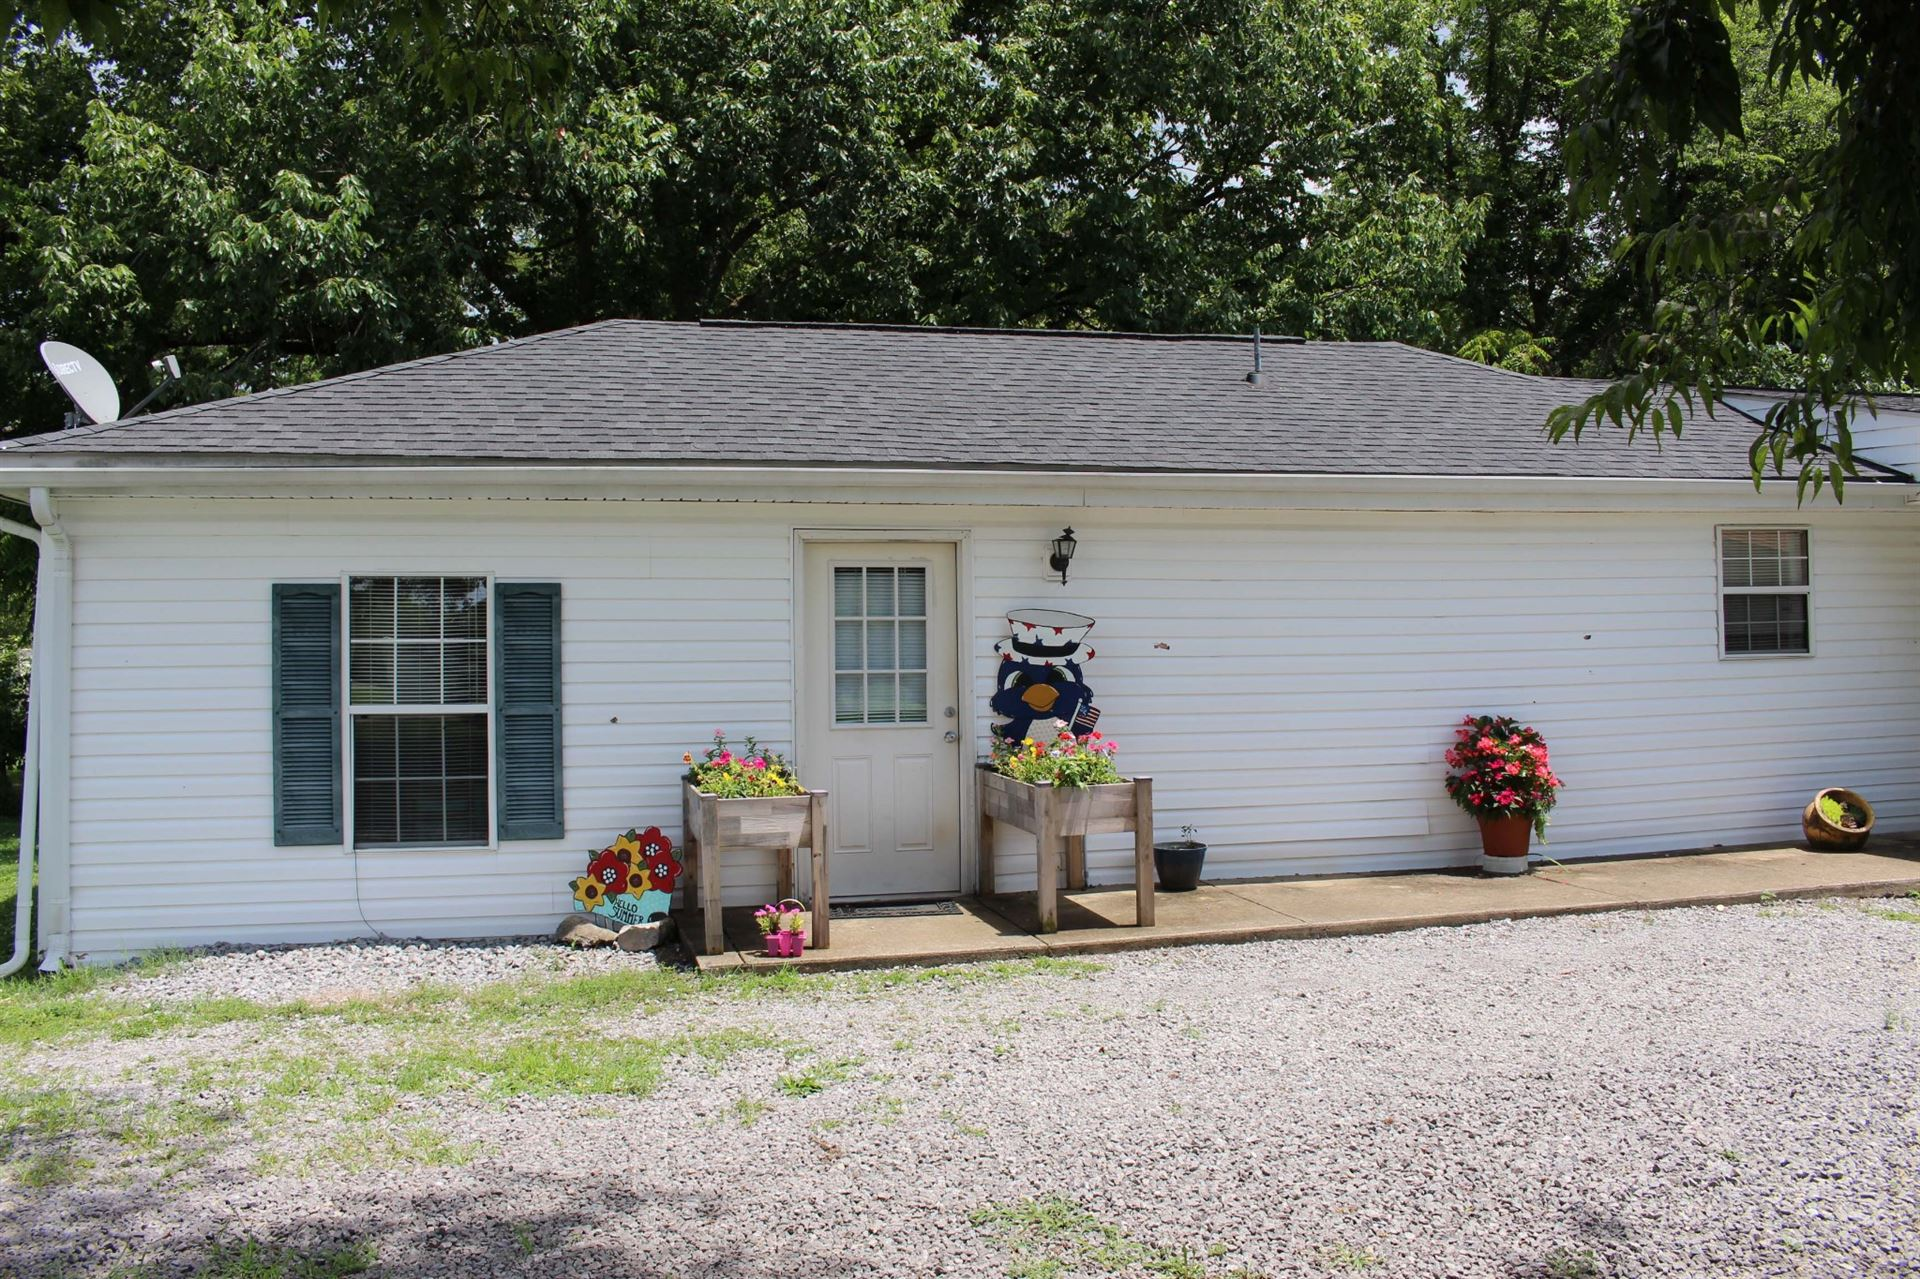 201 Woodcraft Dr, Murfreesboro, TN 37127 - MLS#: 2274535